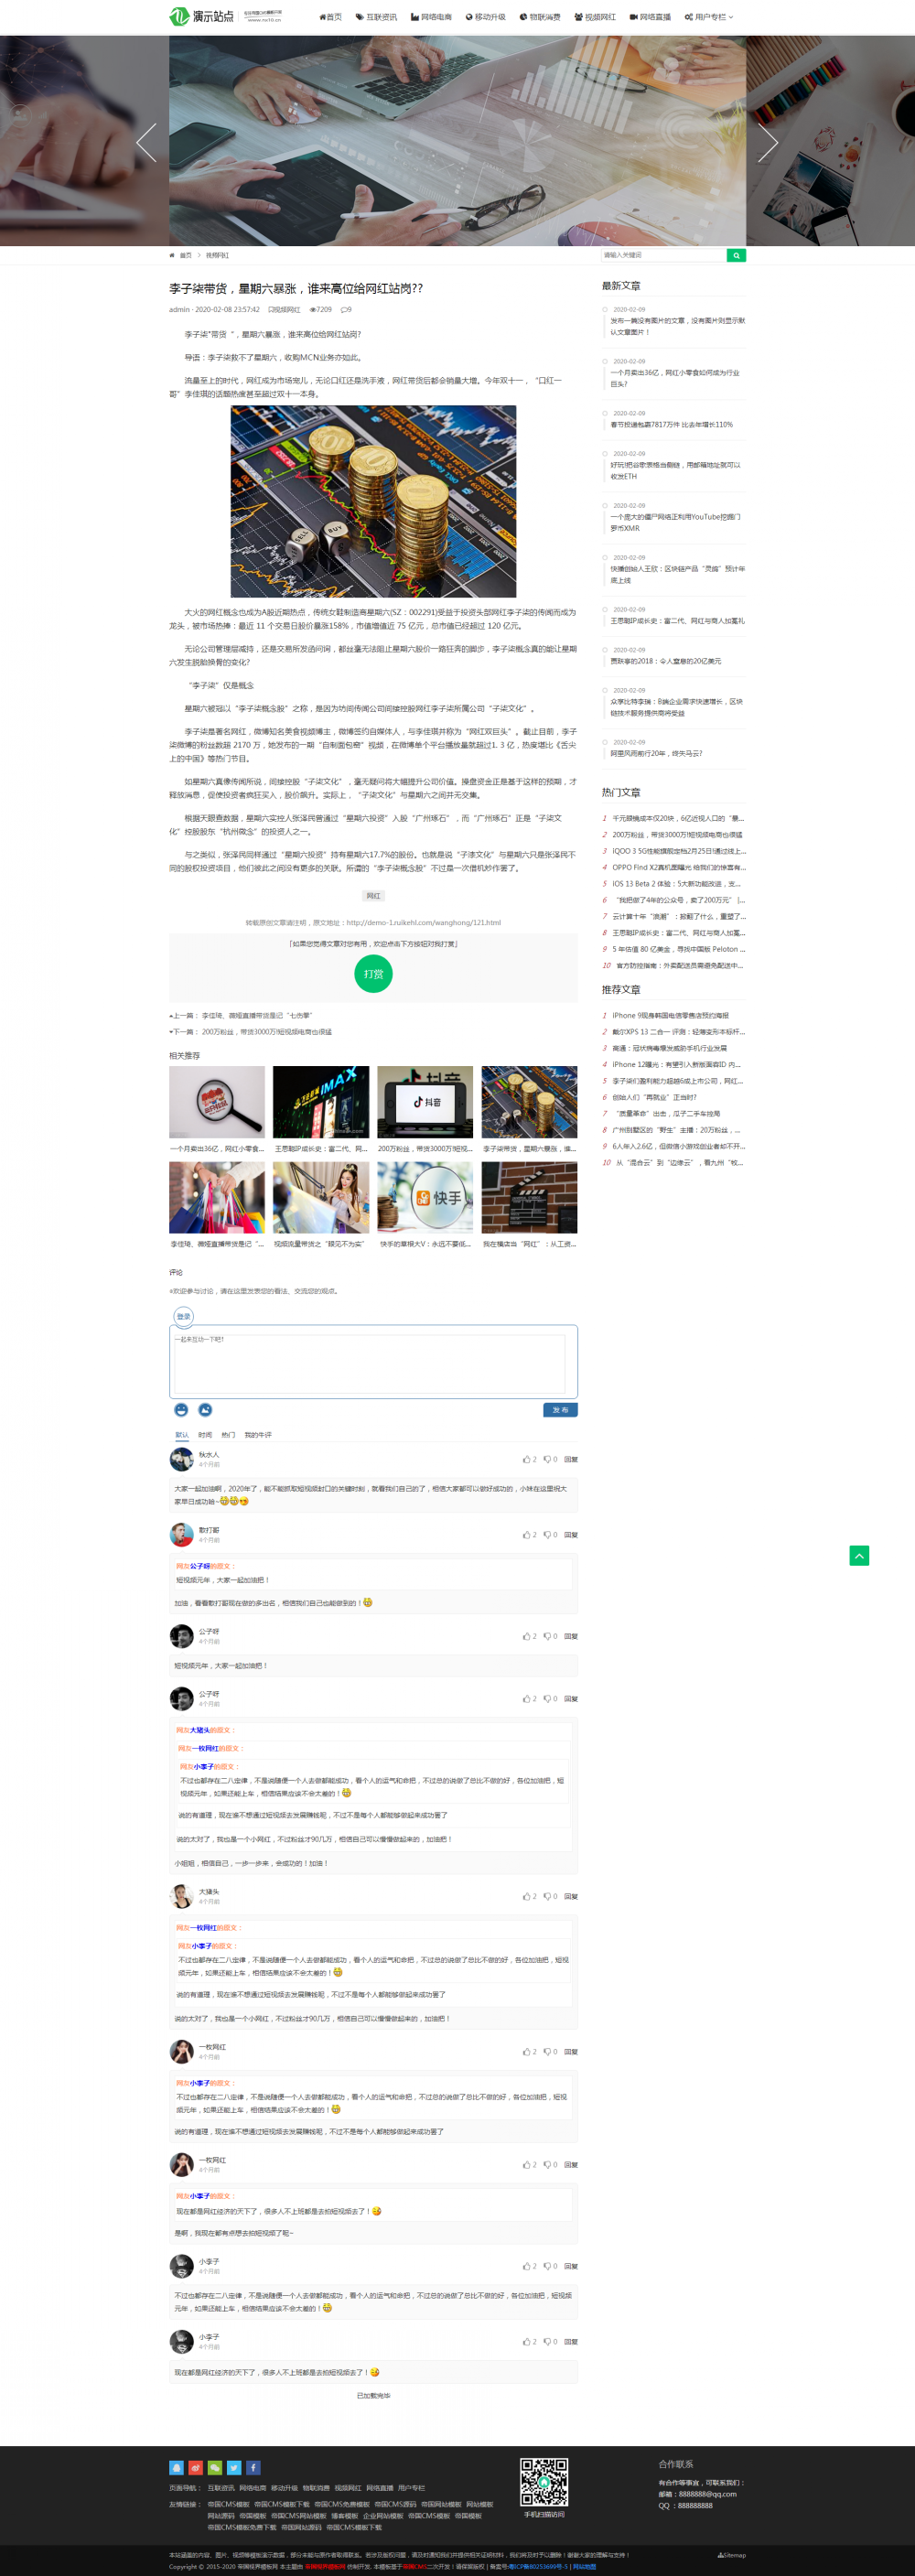 [DG-105]帝国CM响应式产品资讯模板,企业公司产品介绍资讯网站模板 [DG-105]帝国CM响应式产品资讯模板,企业公司产品介绍资讯网站模板 新闻资讯 第5张